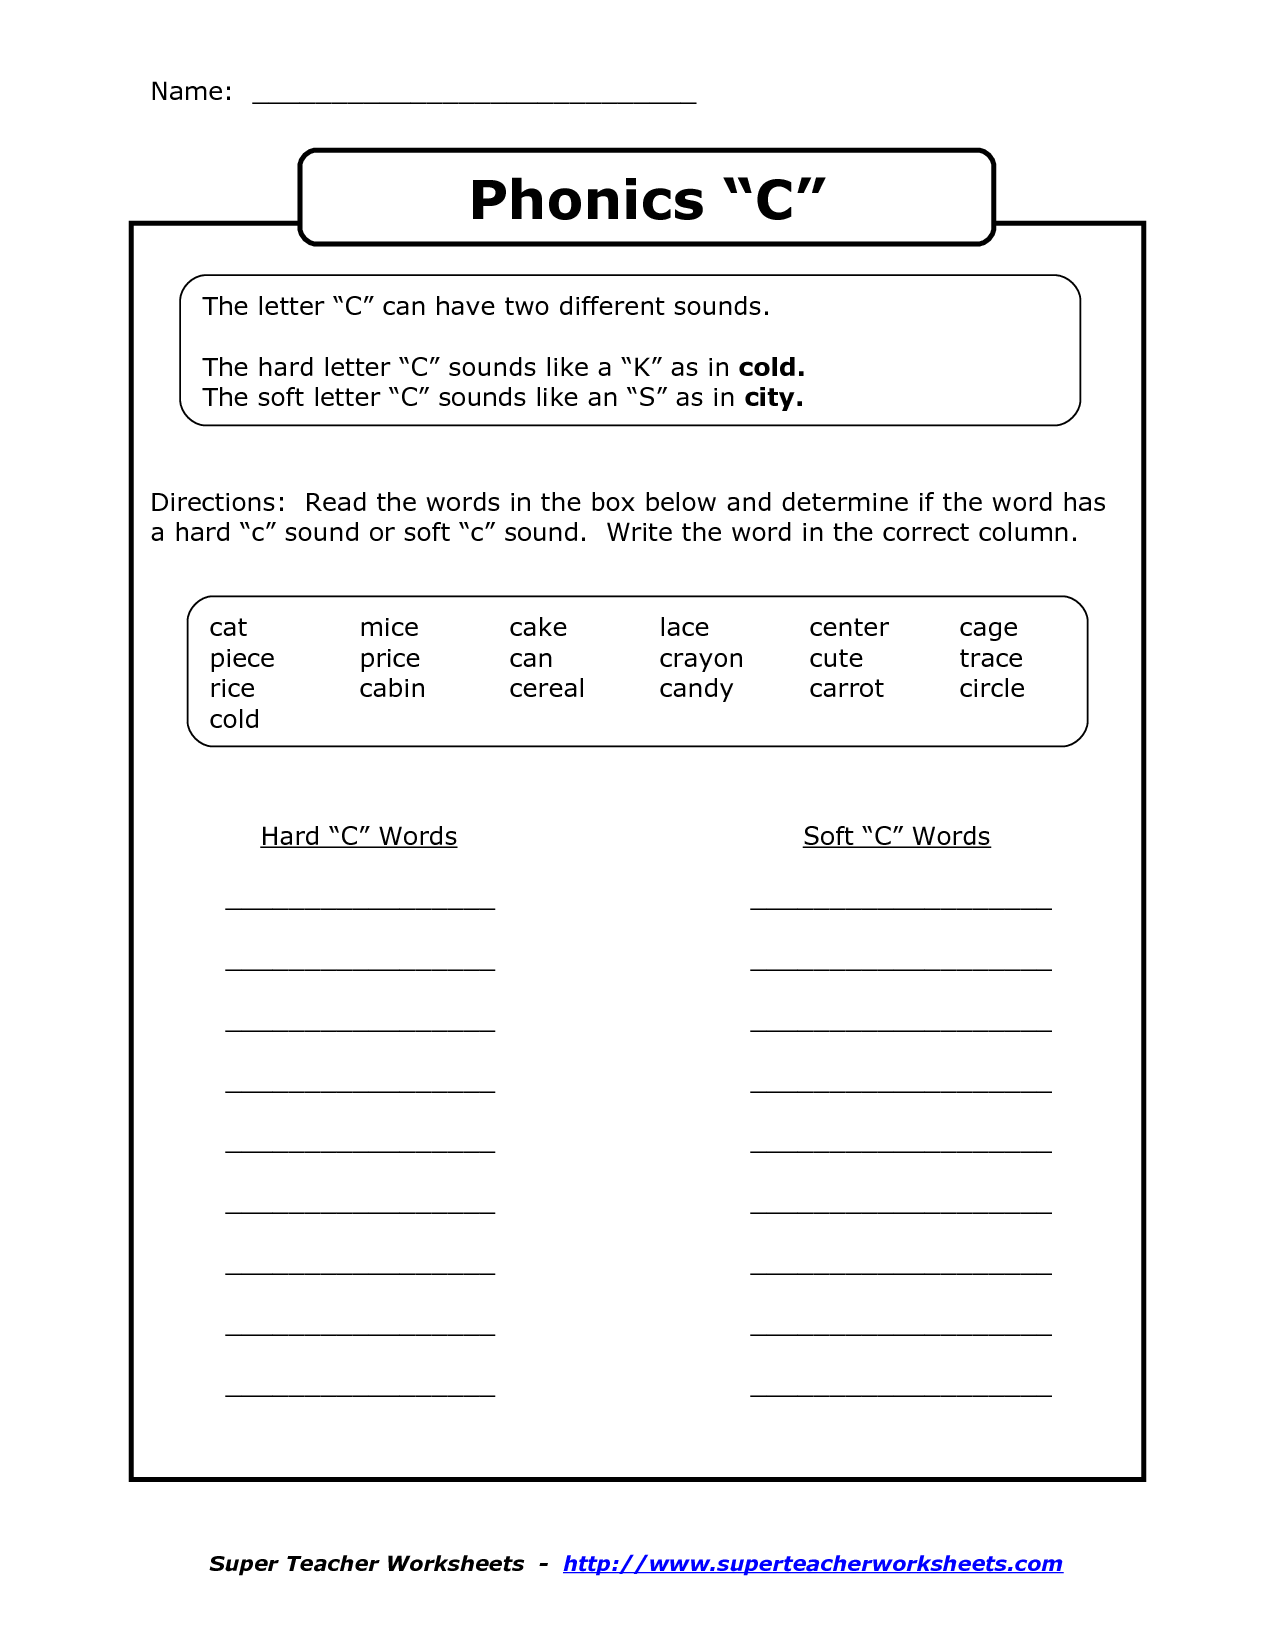 20 Best Images Of Correct Letter Writing Format Worksheet